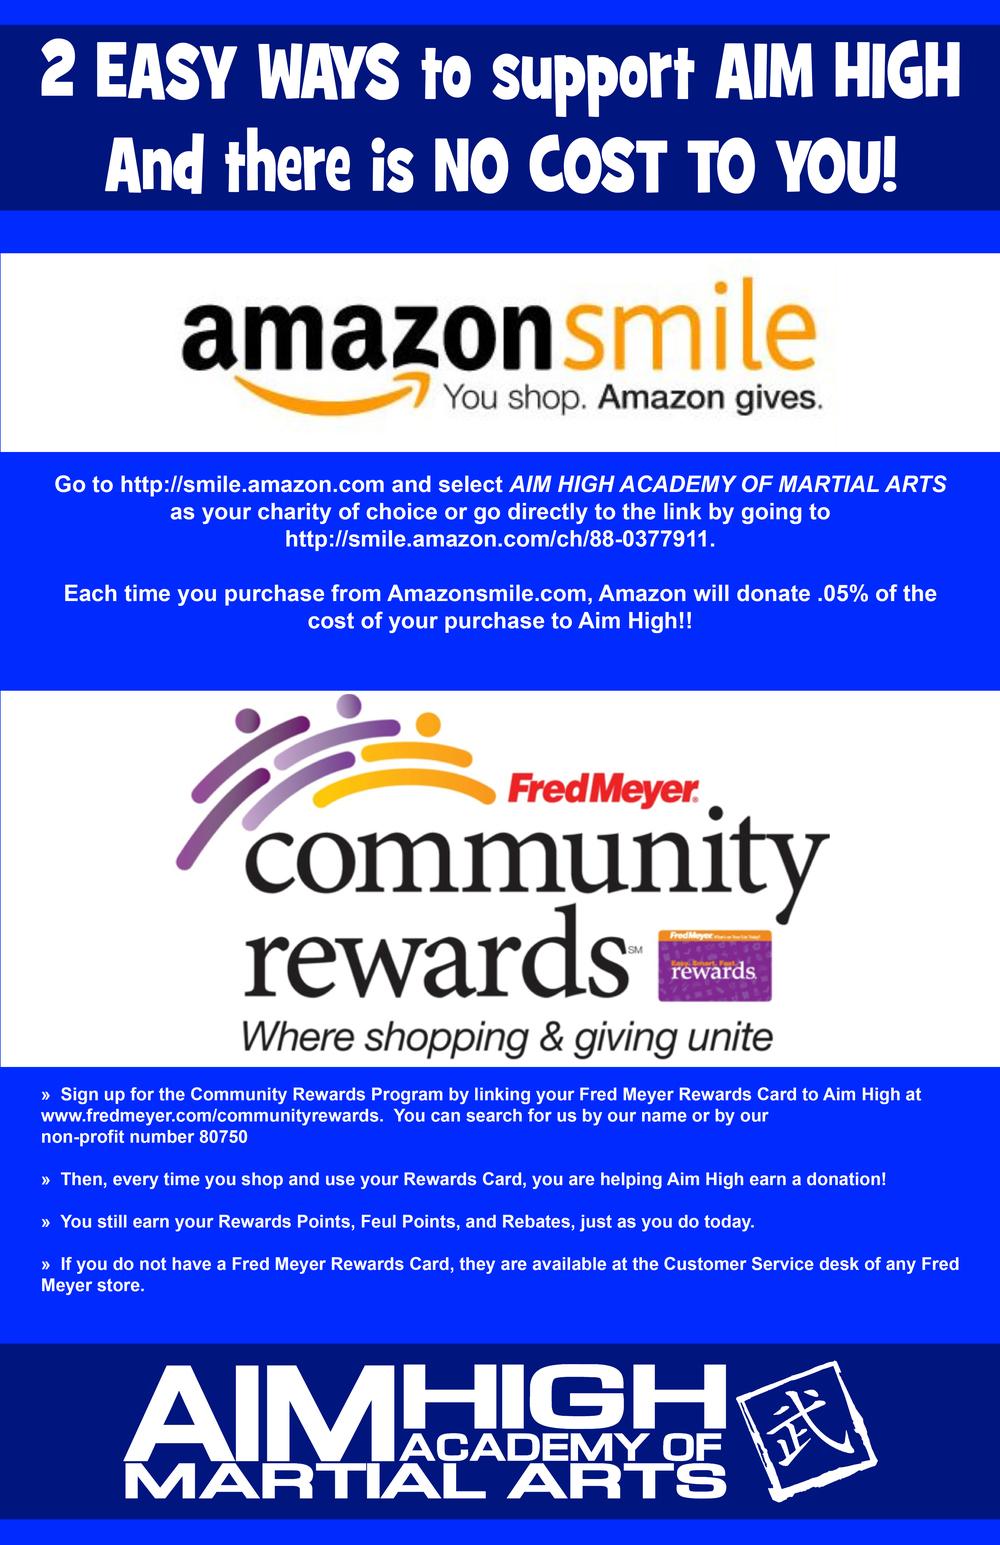 amazon_smile_fred_meyer_rewards.jpg